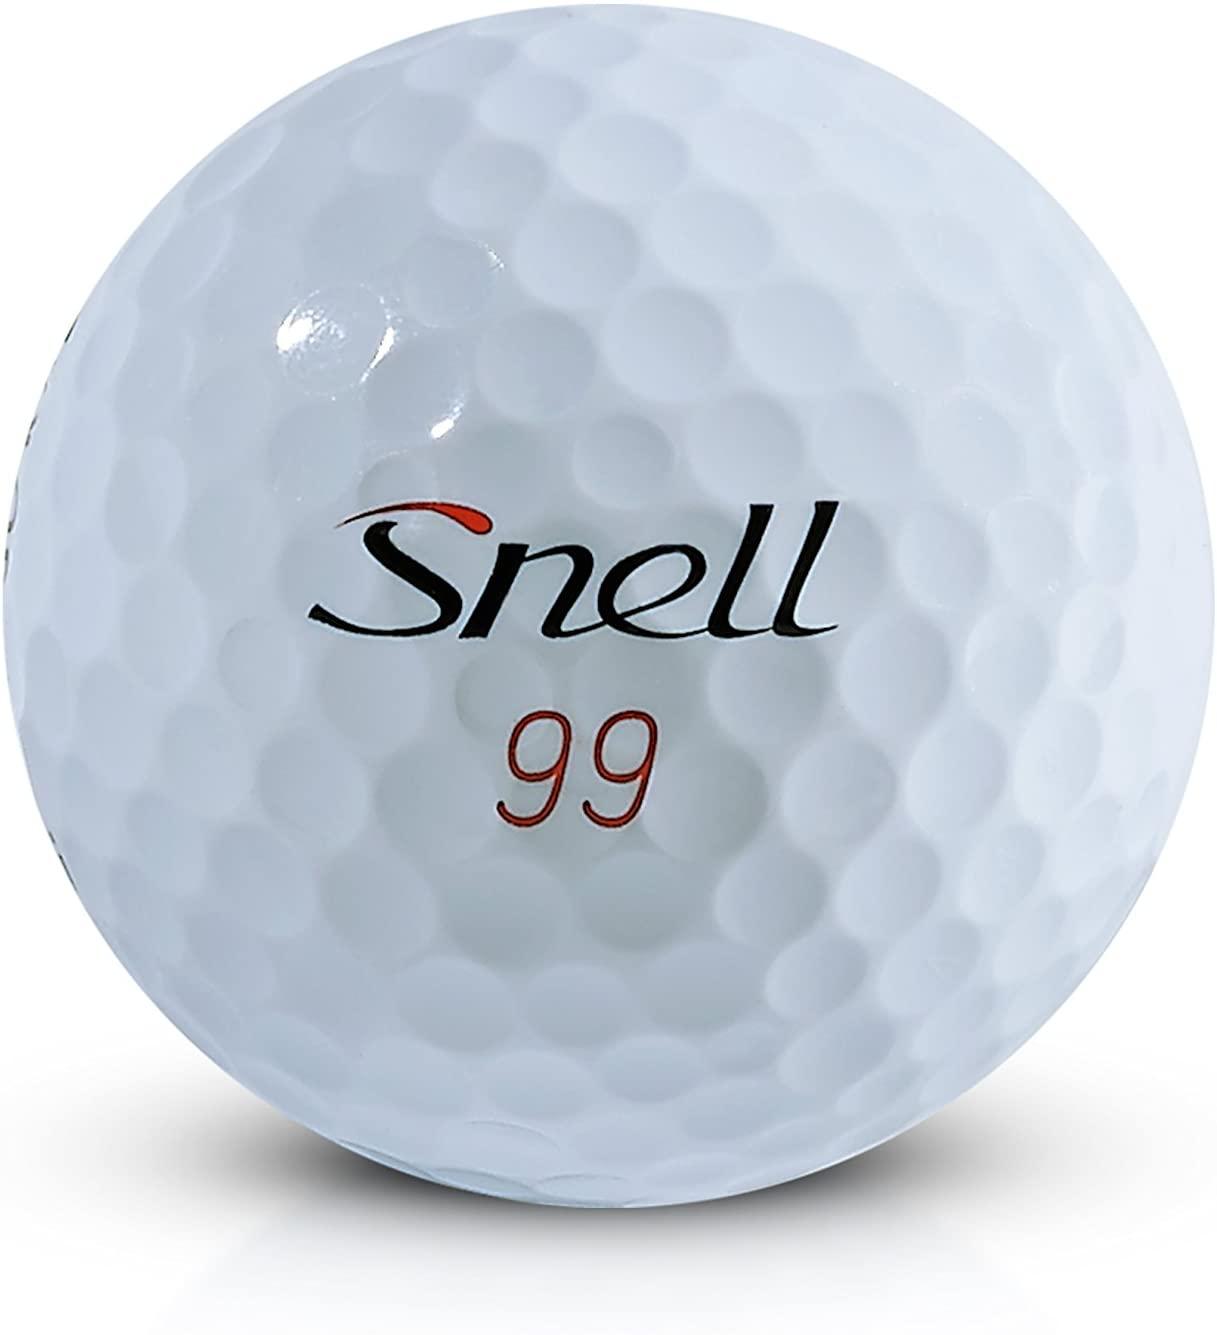 best golf balls of 2020 - snell